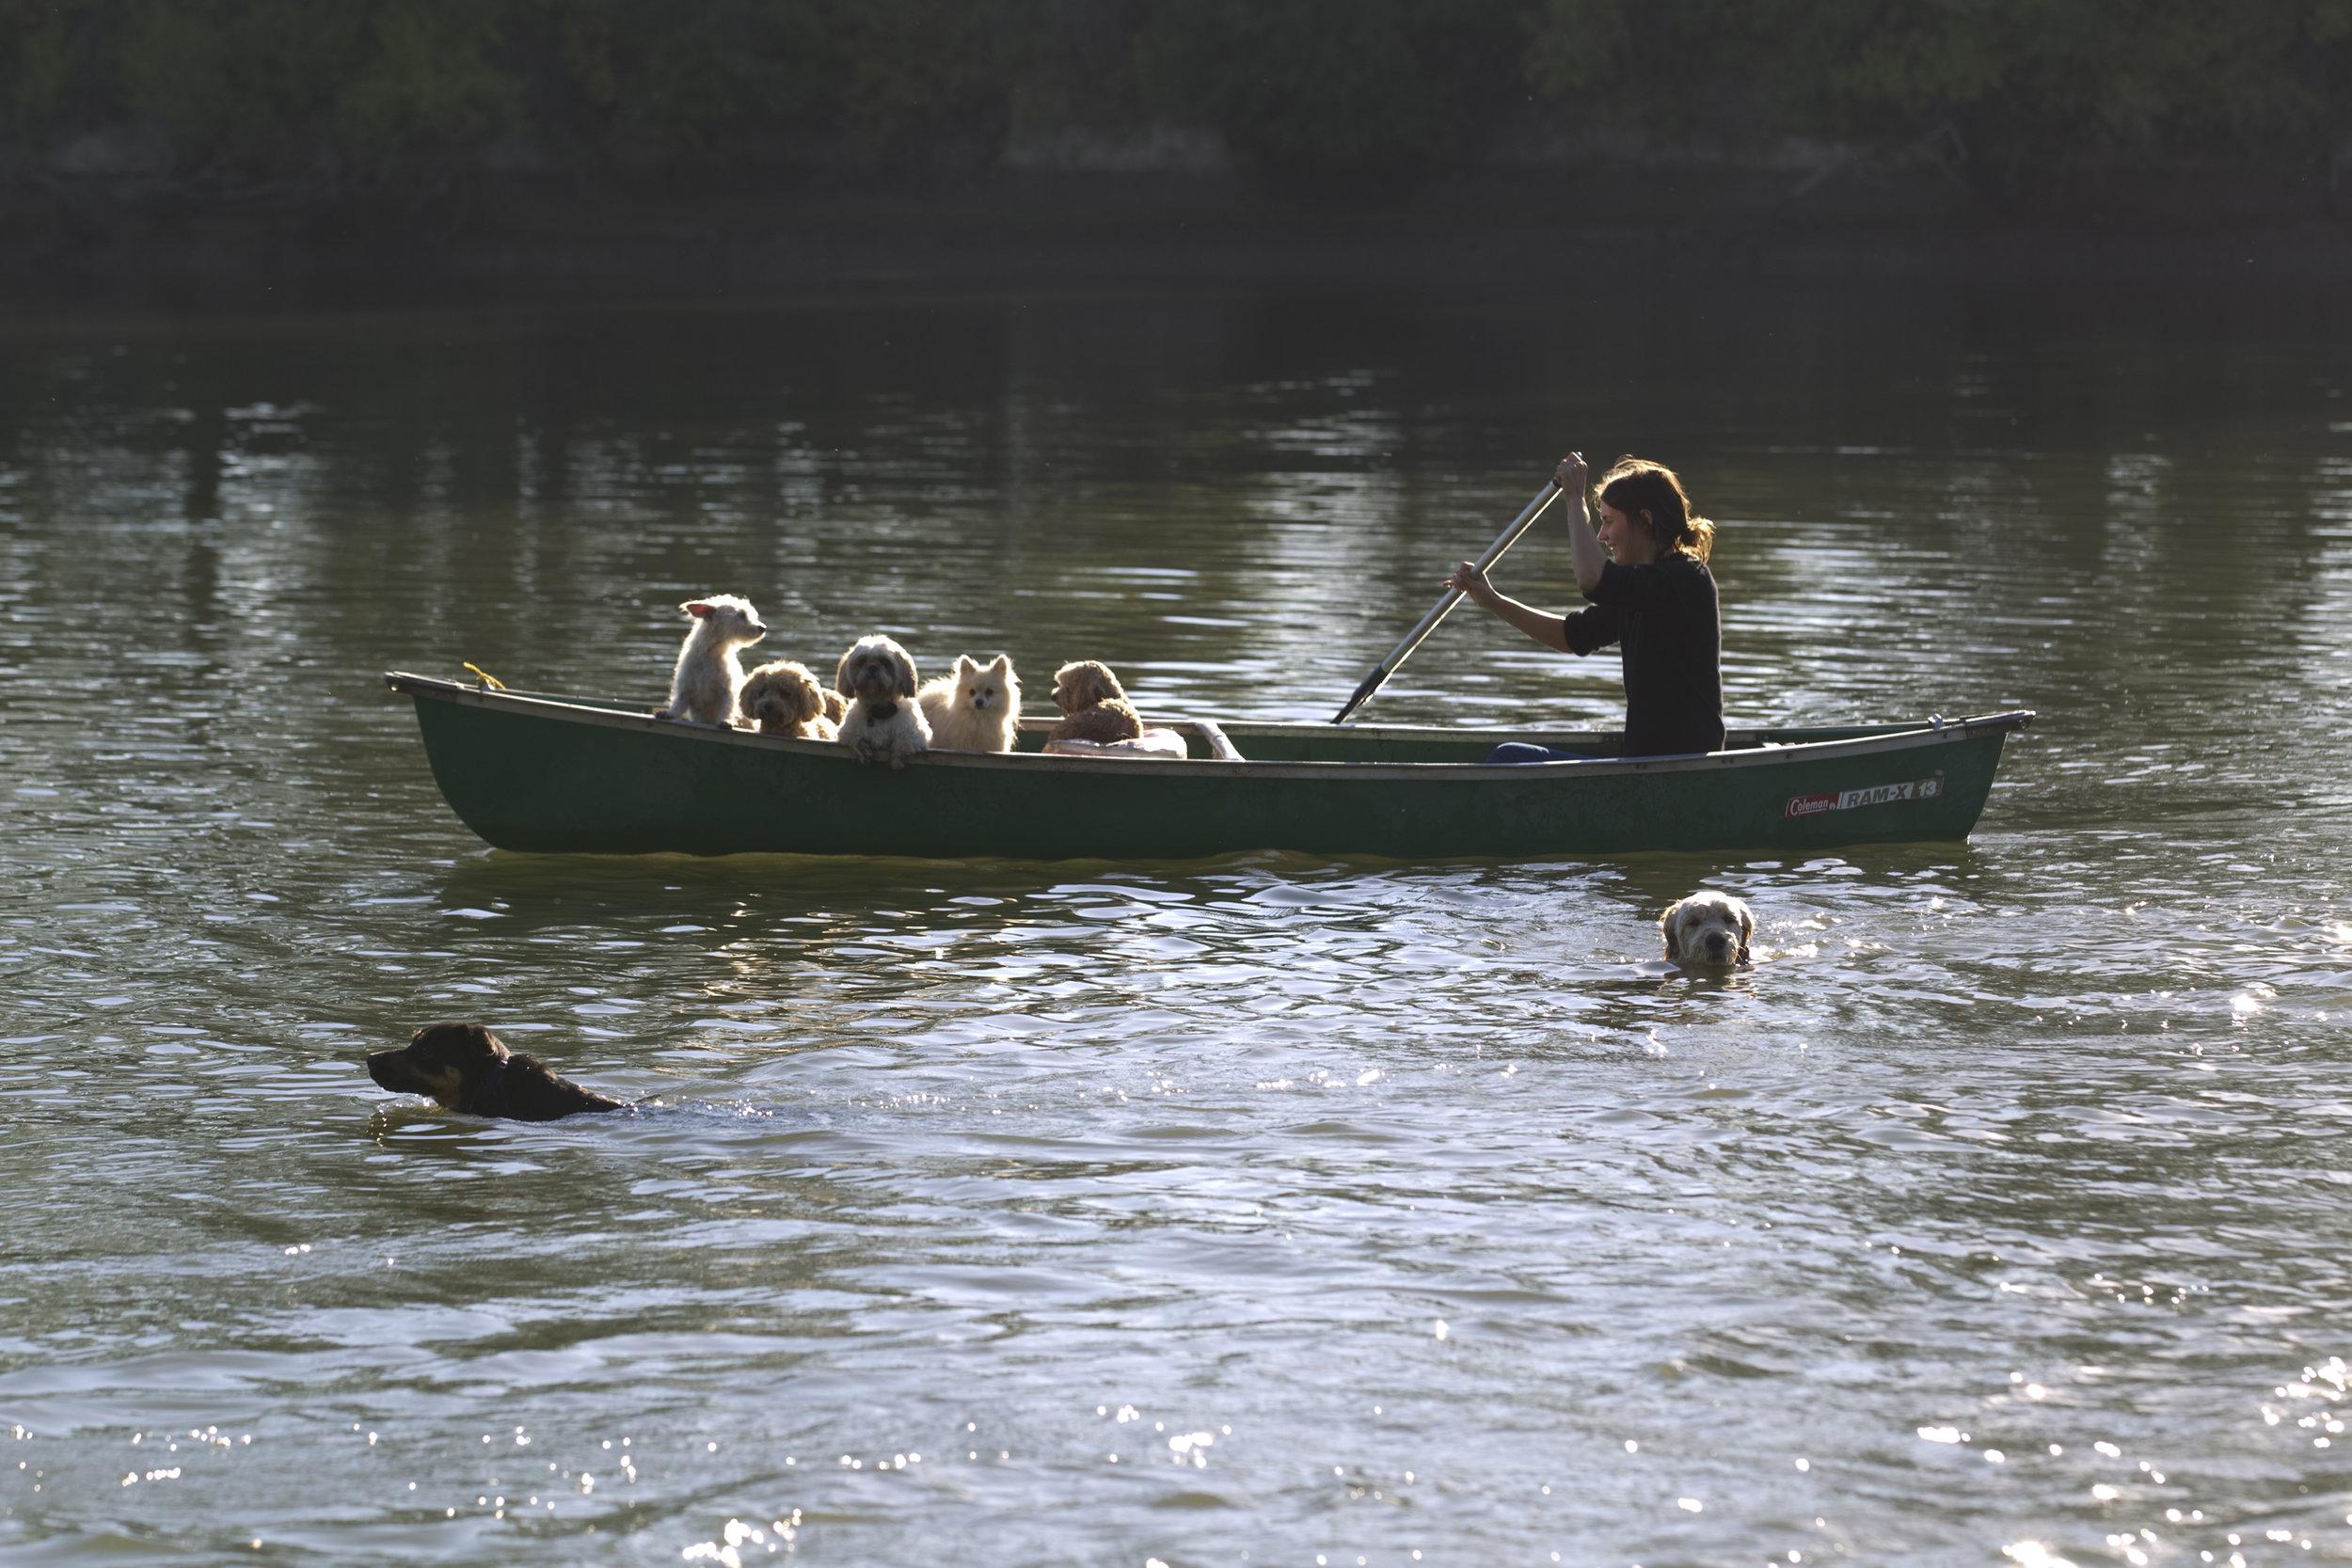 2016_OregonTails_Canoe_PhotoMurray07.jpg